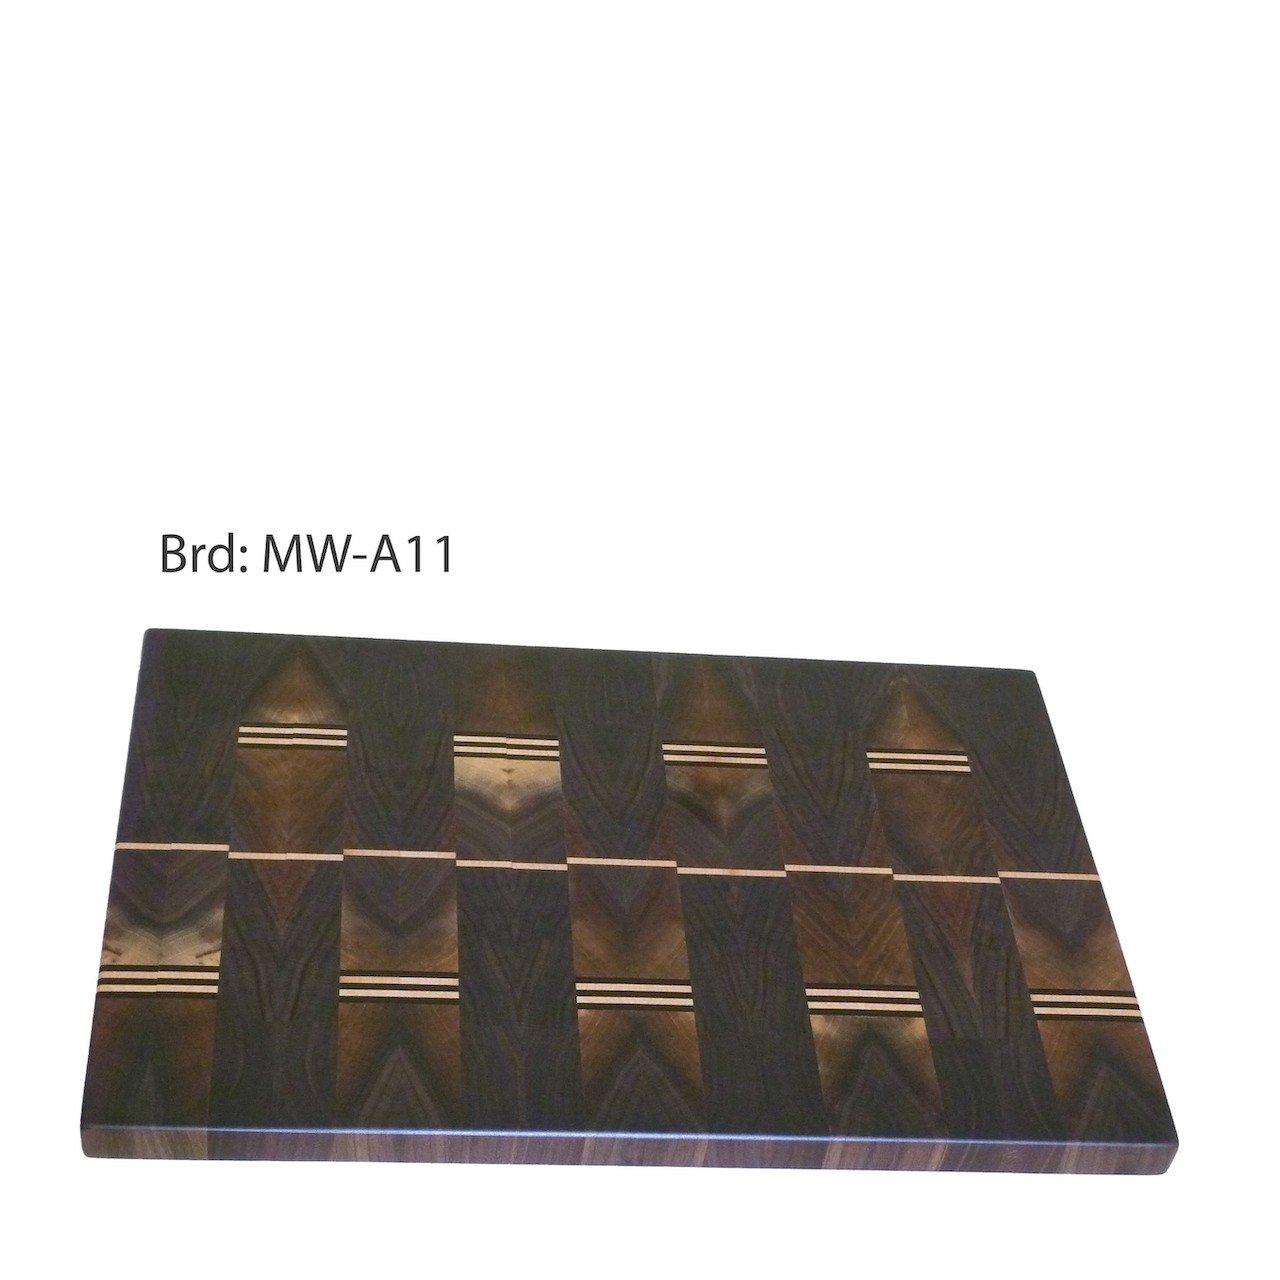 MW-A11